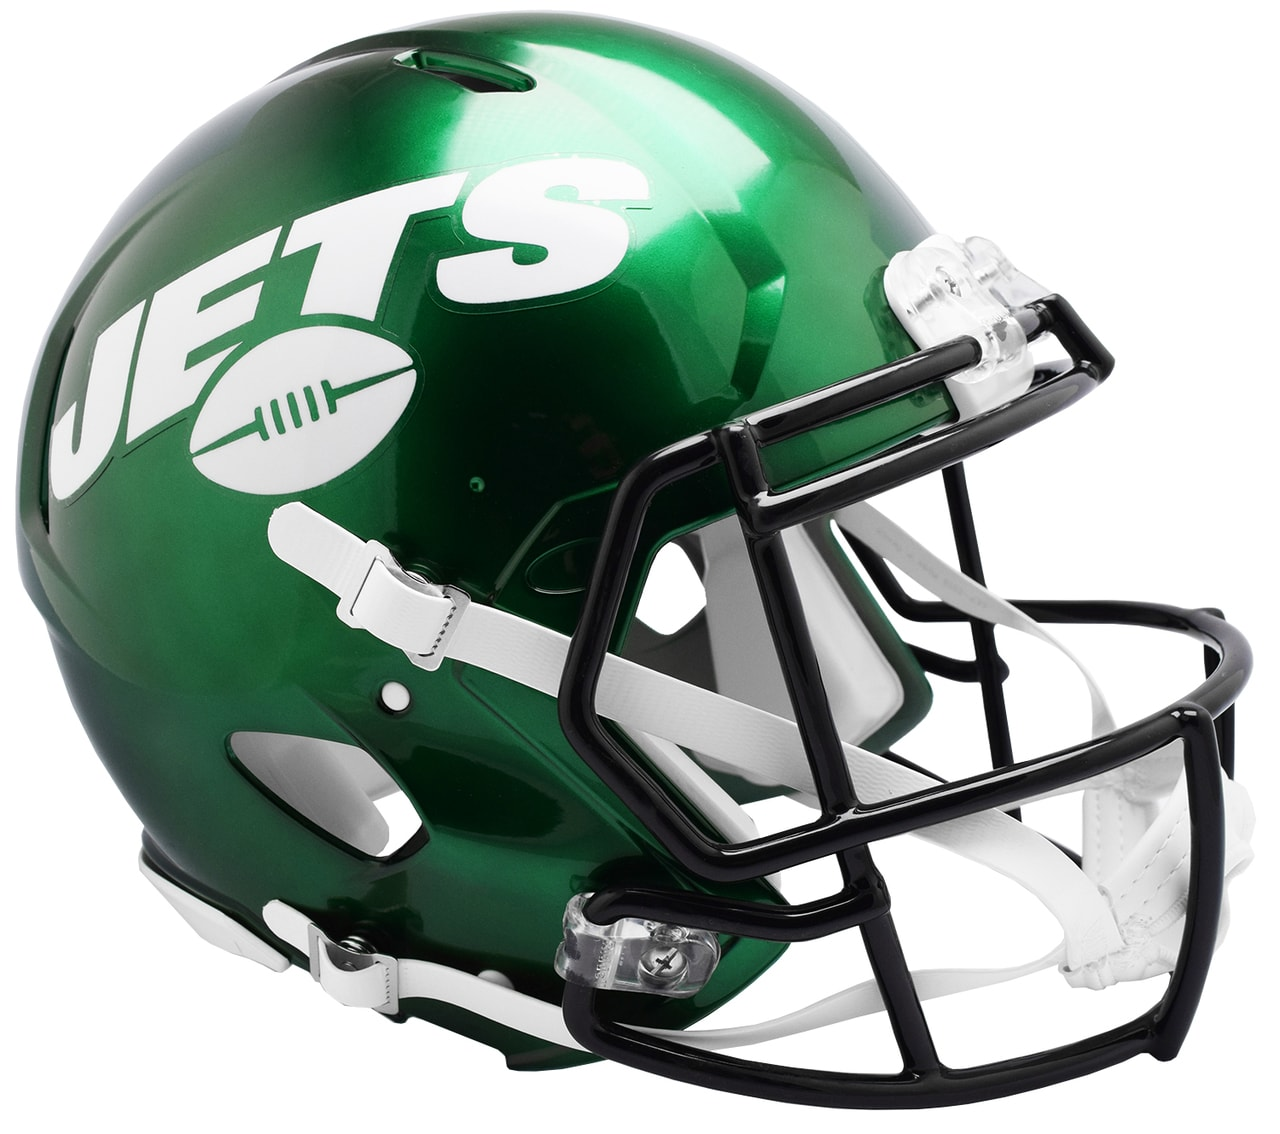 New York Jets Football Helmets